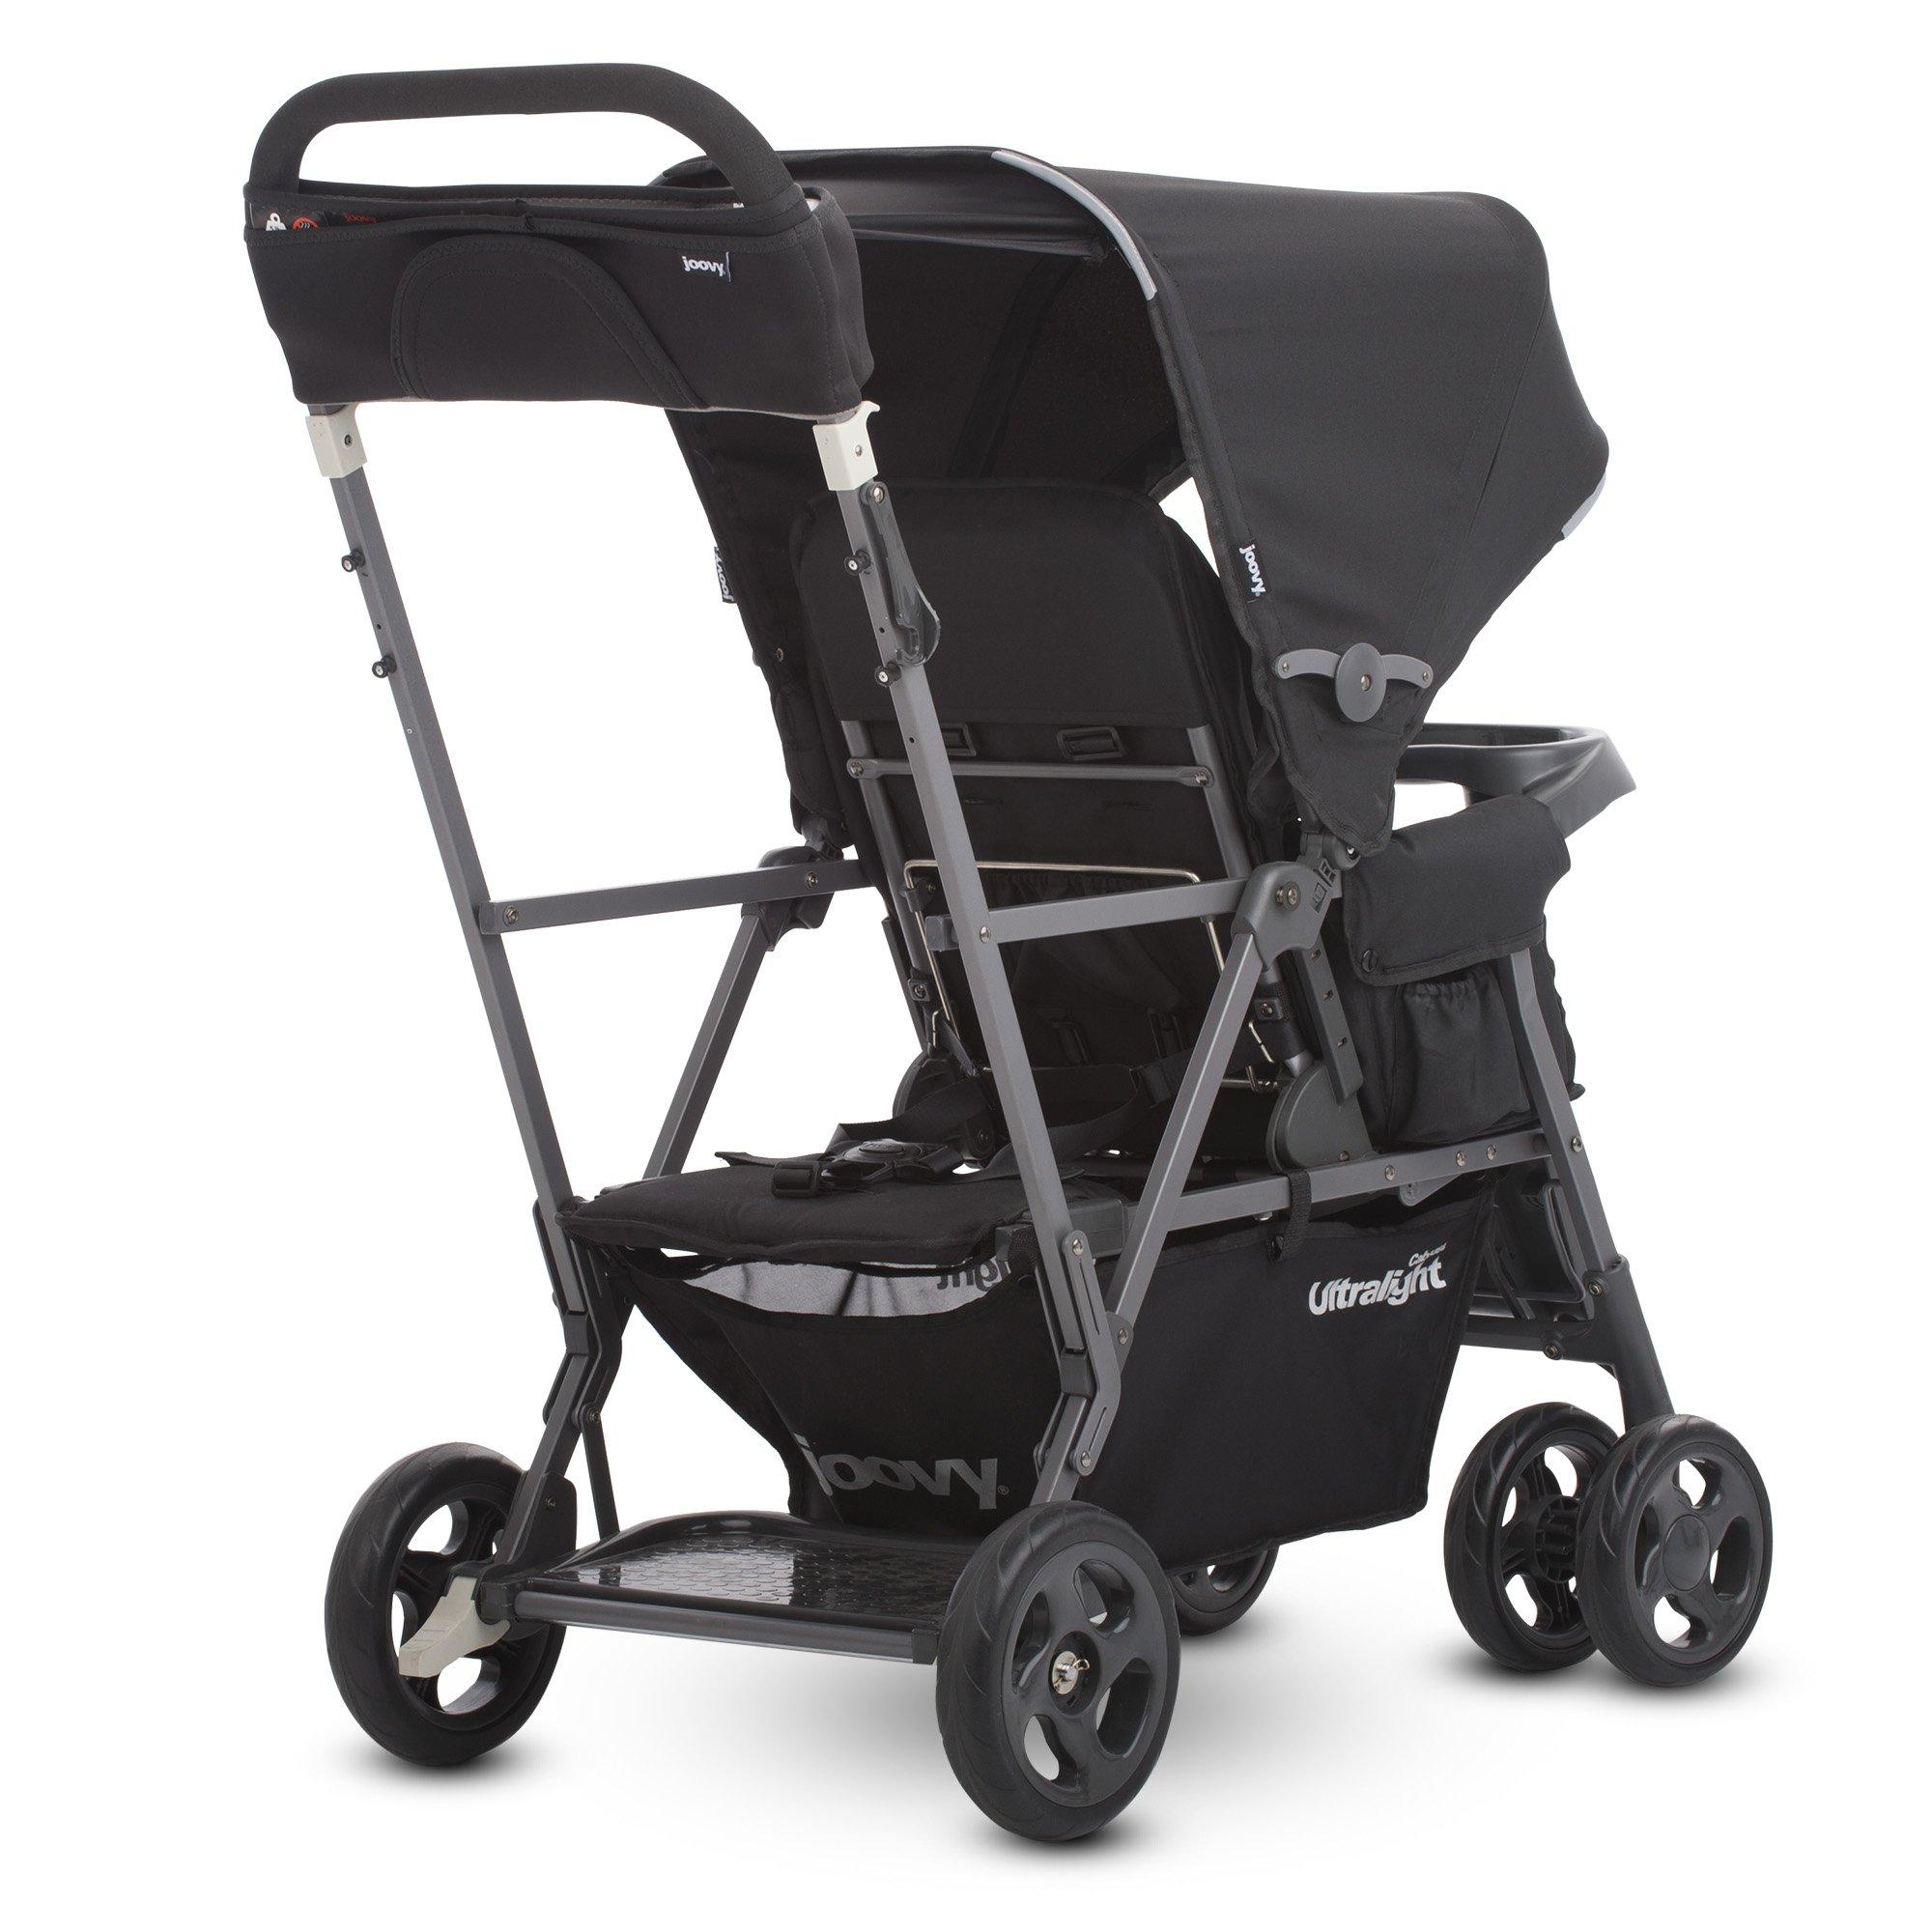 Joovy Caboose Ultralight Graphite Stroller, Black by Joovy (Image #2)